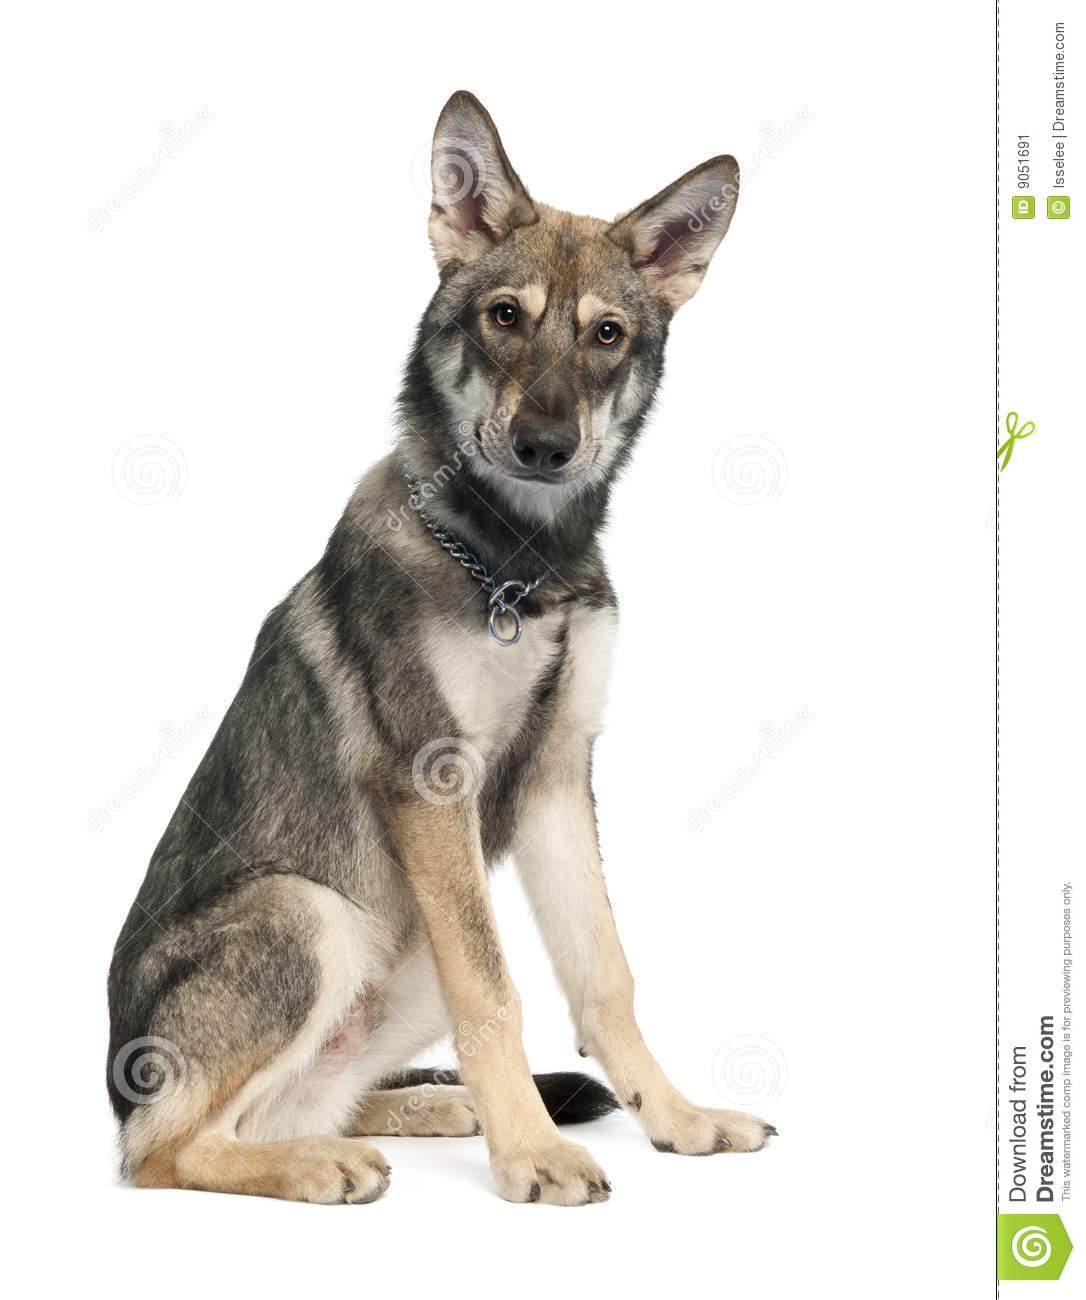 Saarlooswolfhond Puppies: Saarlooswolfhond Stock Saarloos Wolf Dog Puppy Months Old Breed